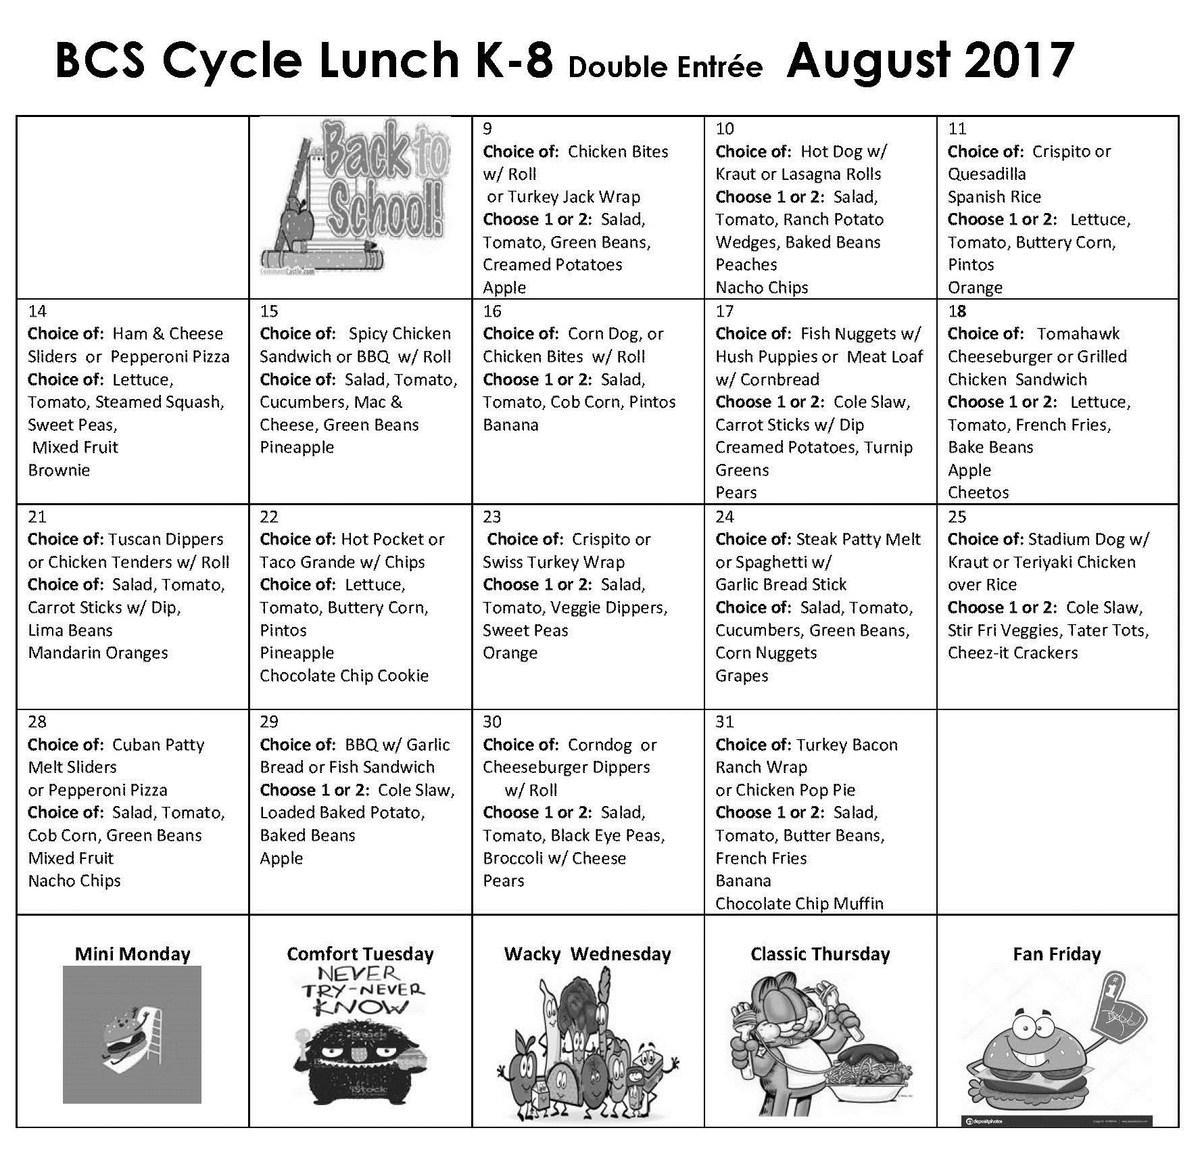 August 2017 Lunch Menu